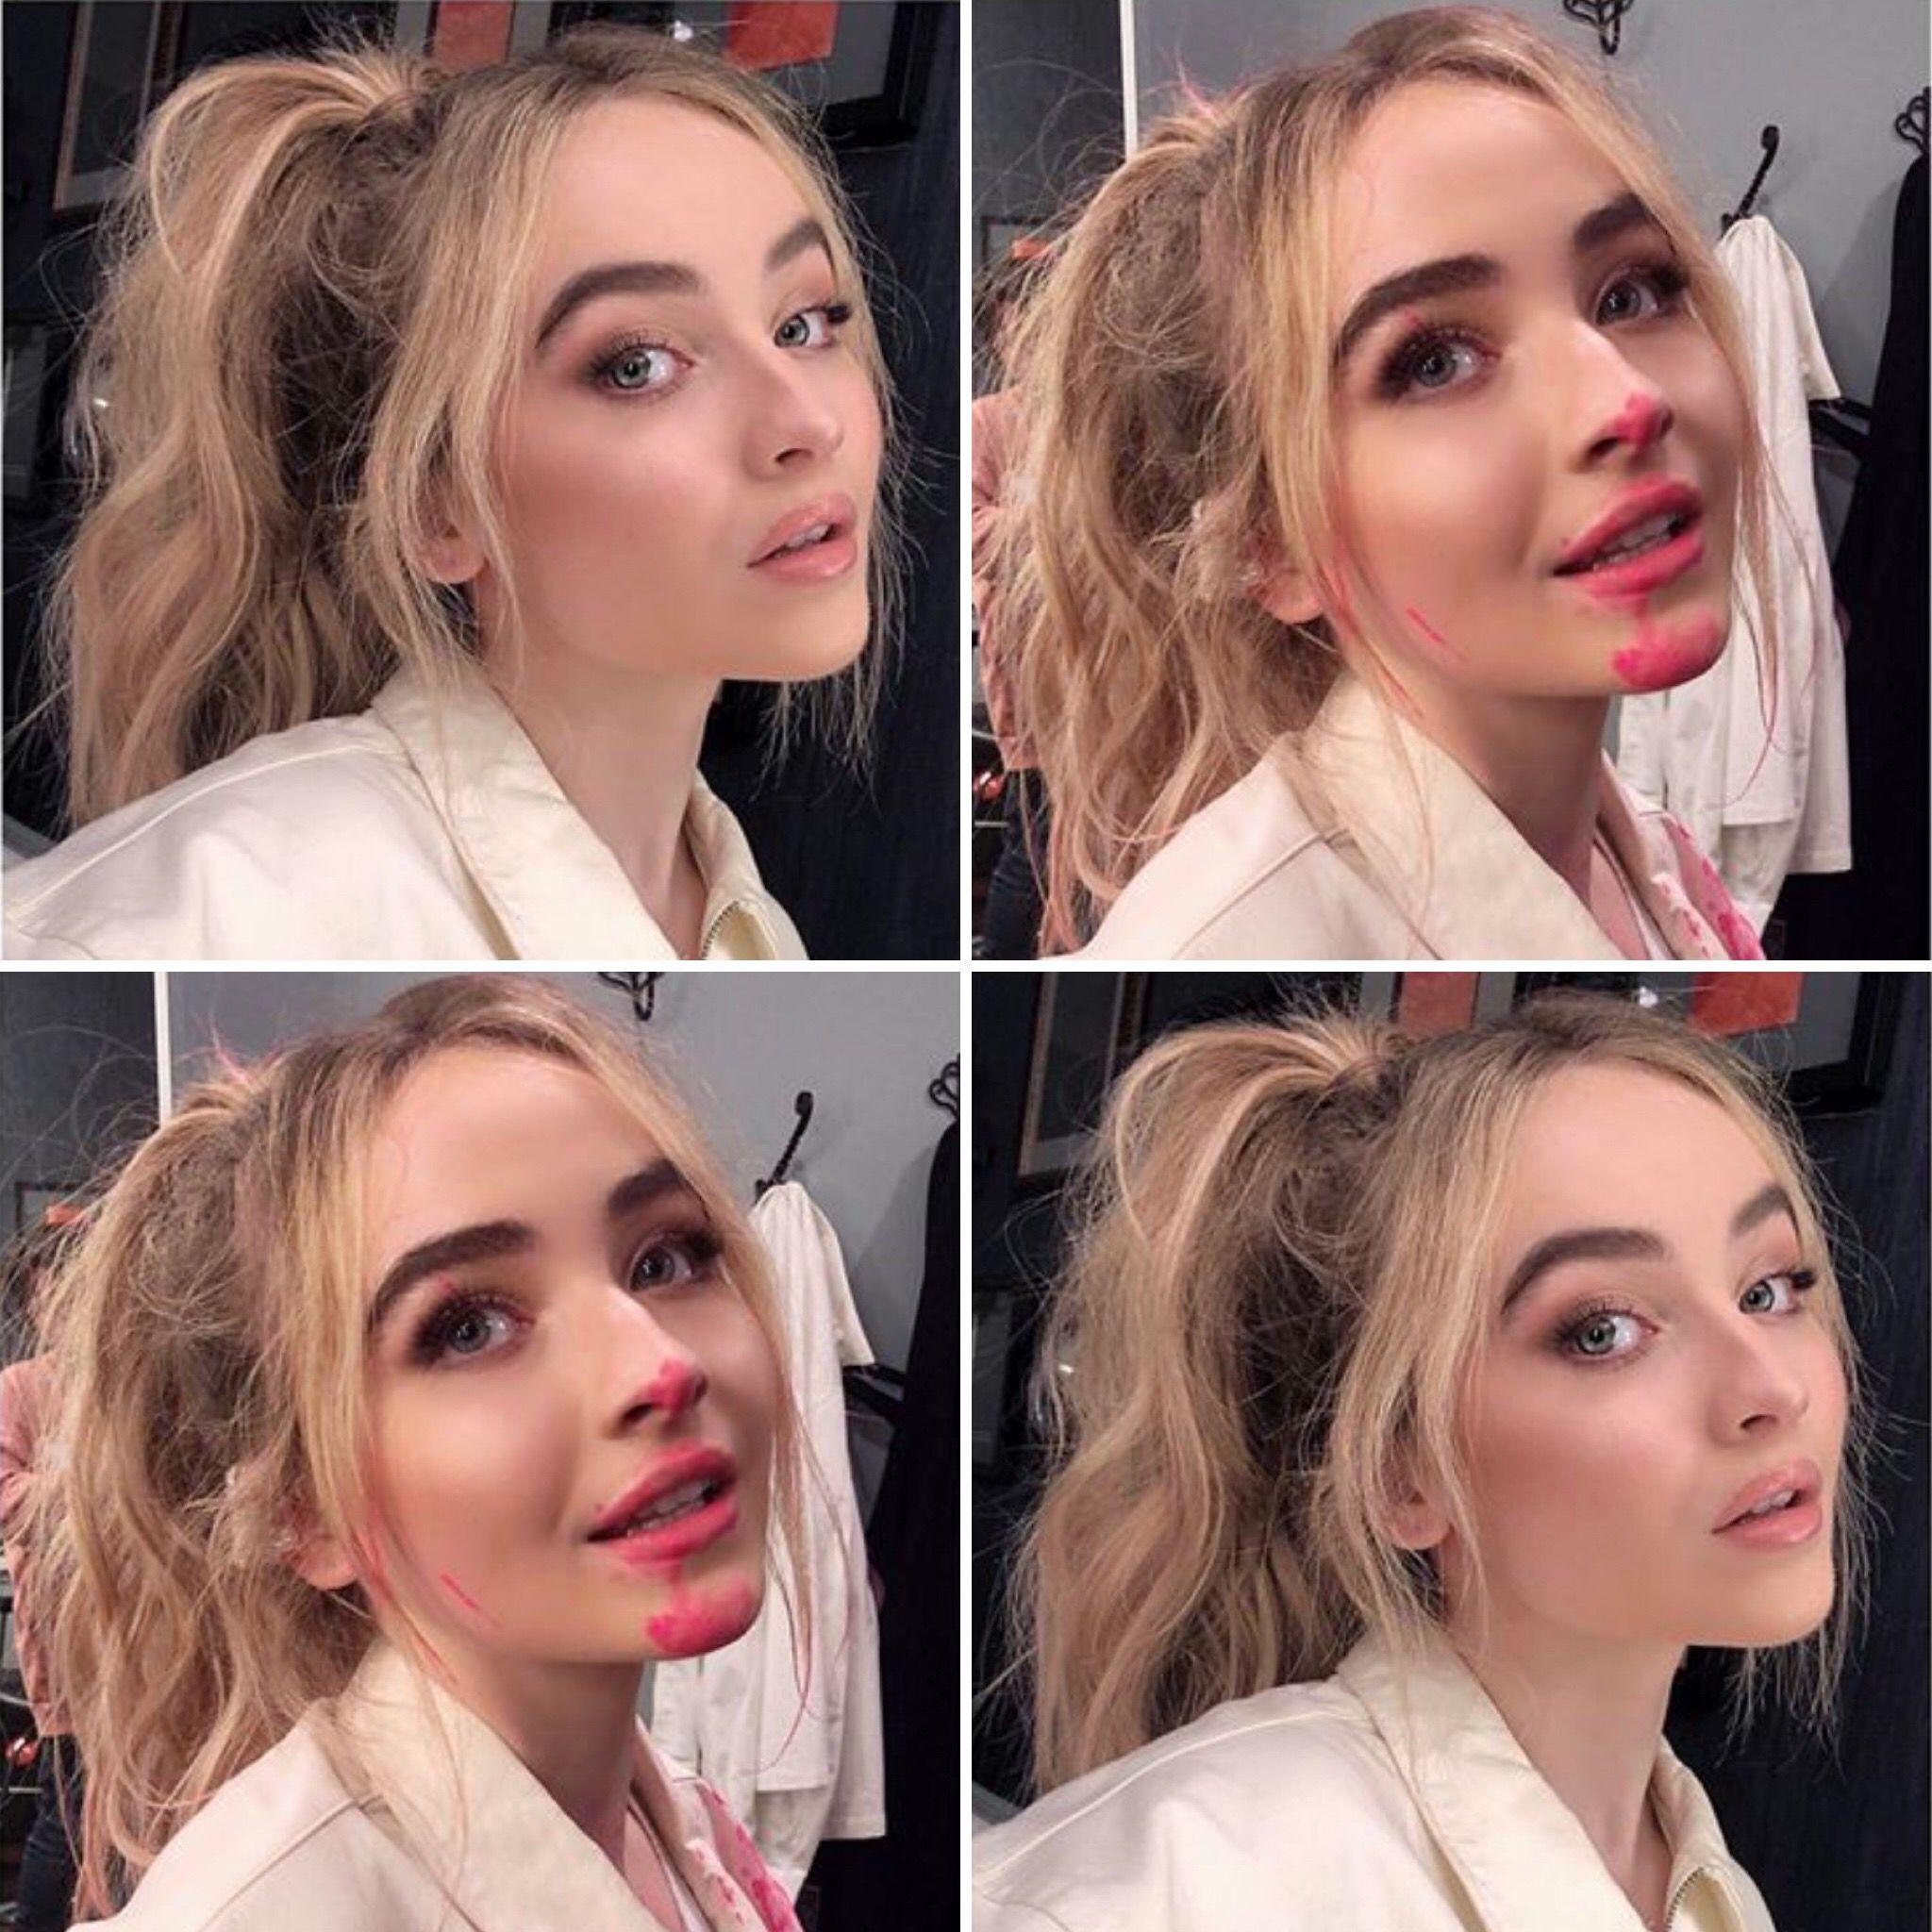 2018 Sabrina Carpenter before and after photos by make